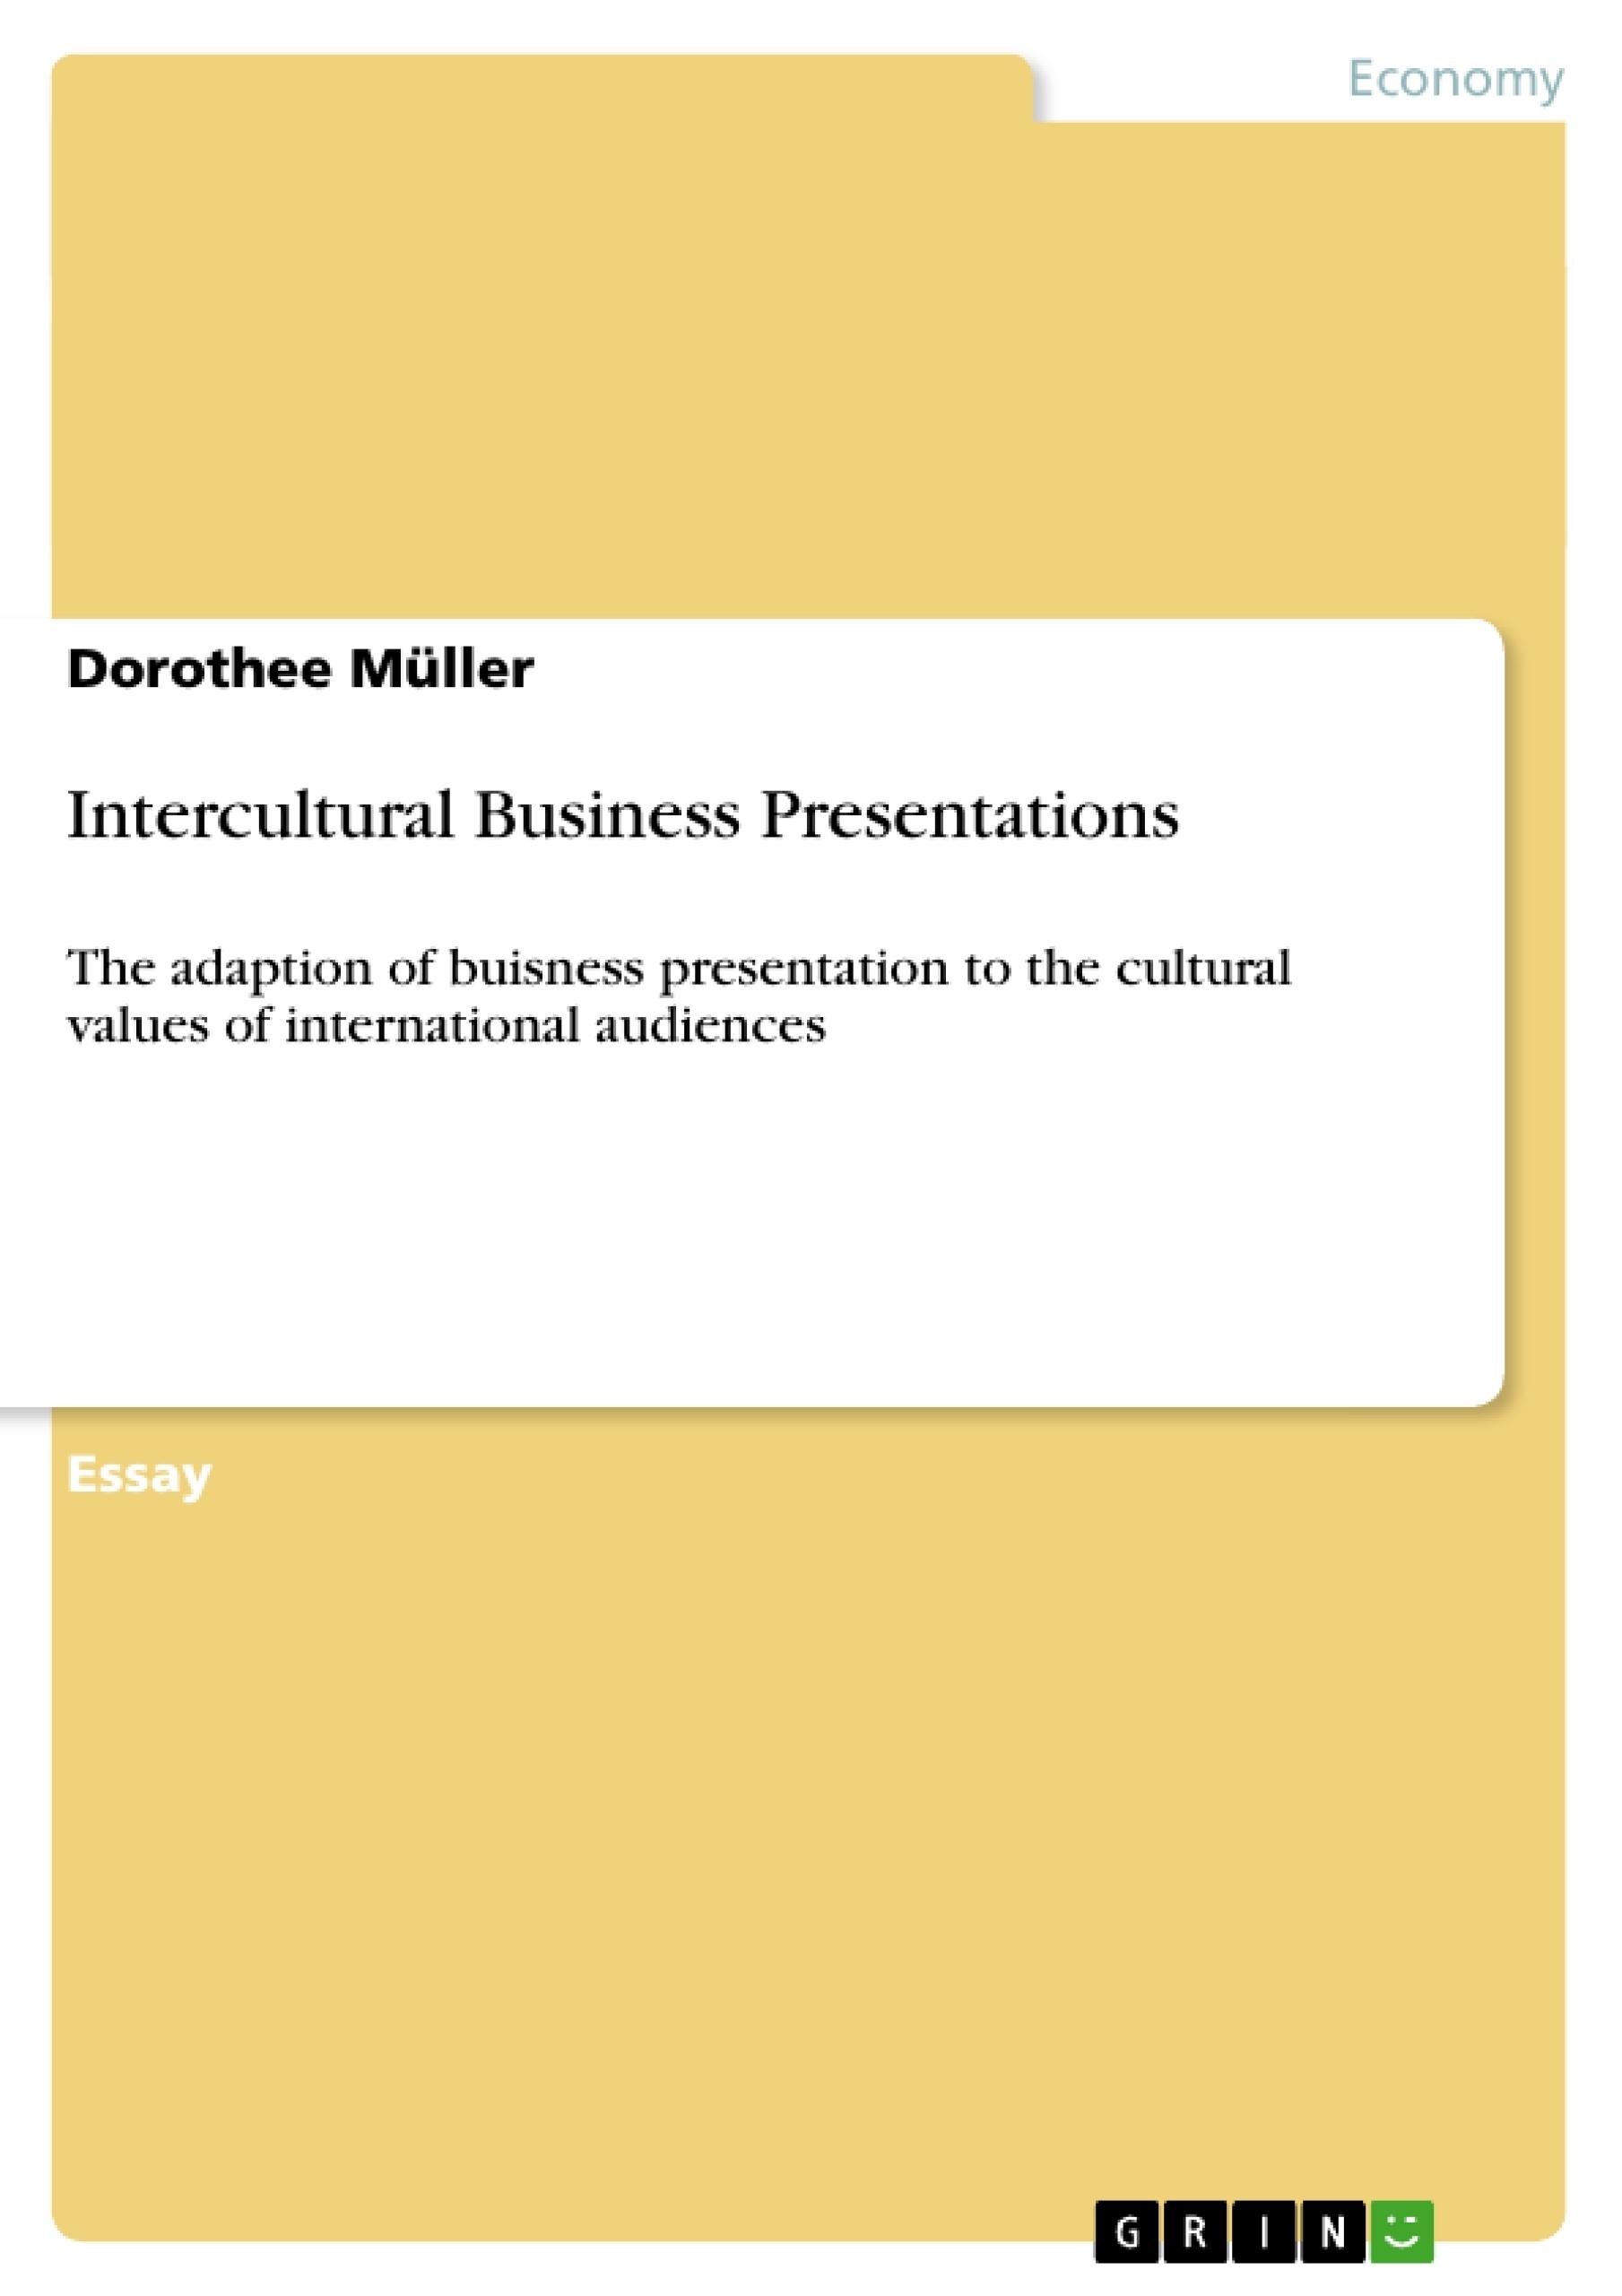 Title: Intercultural Business Presentations